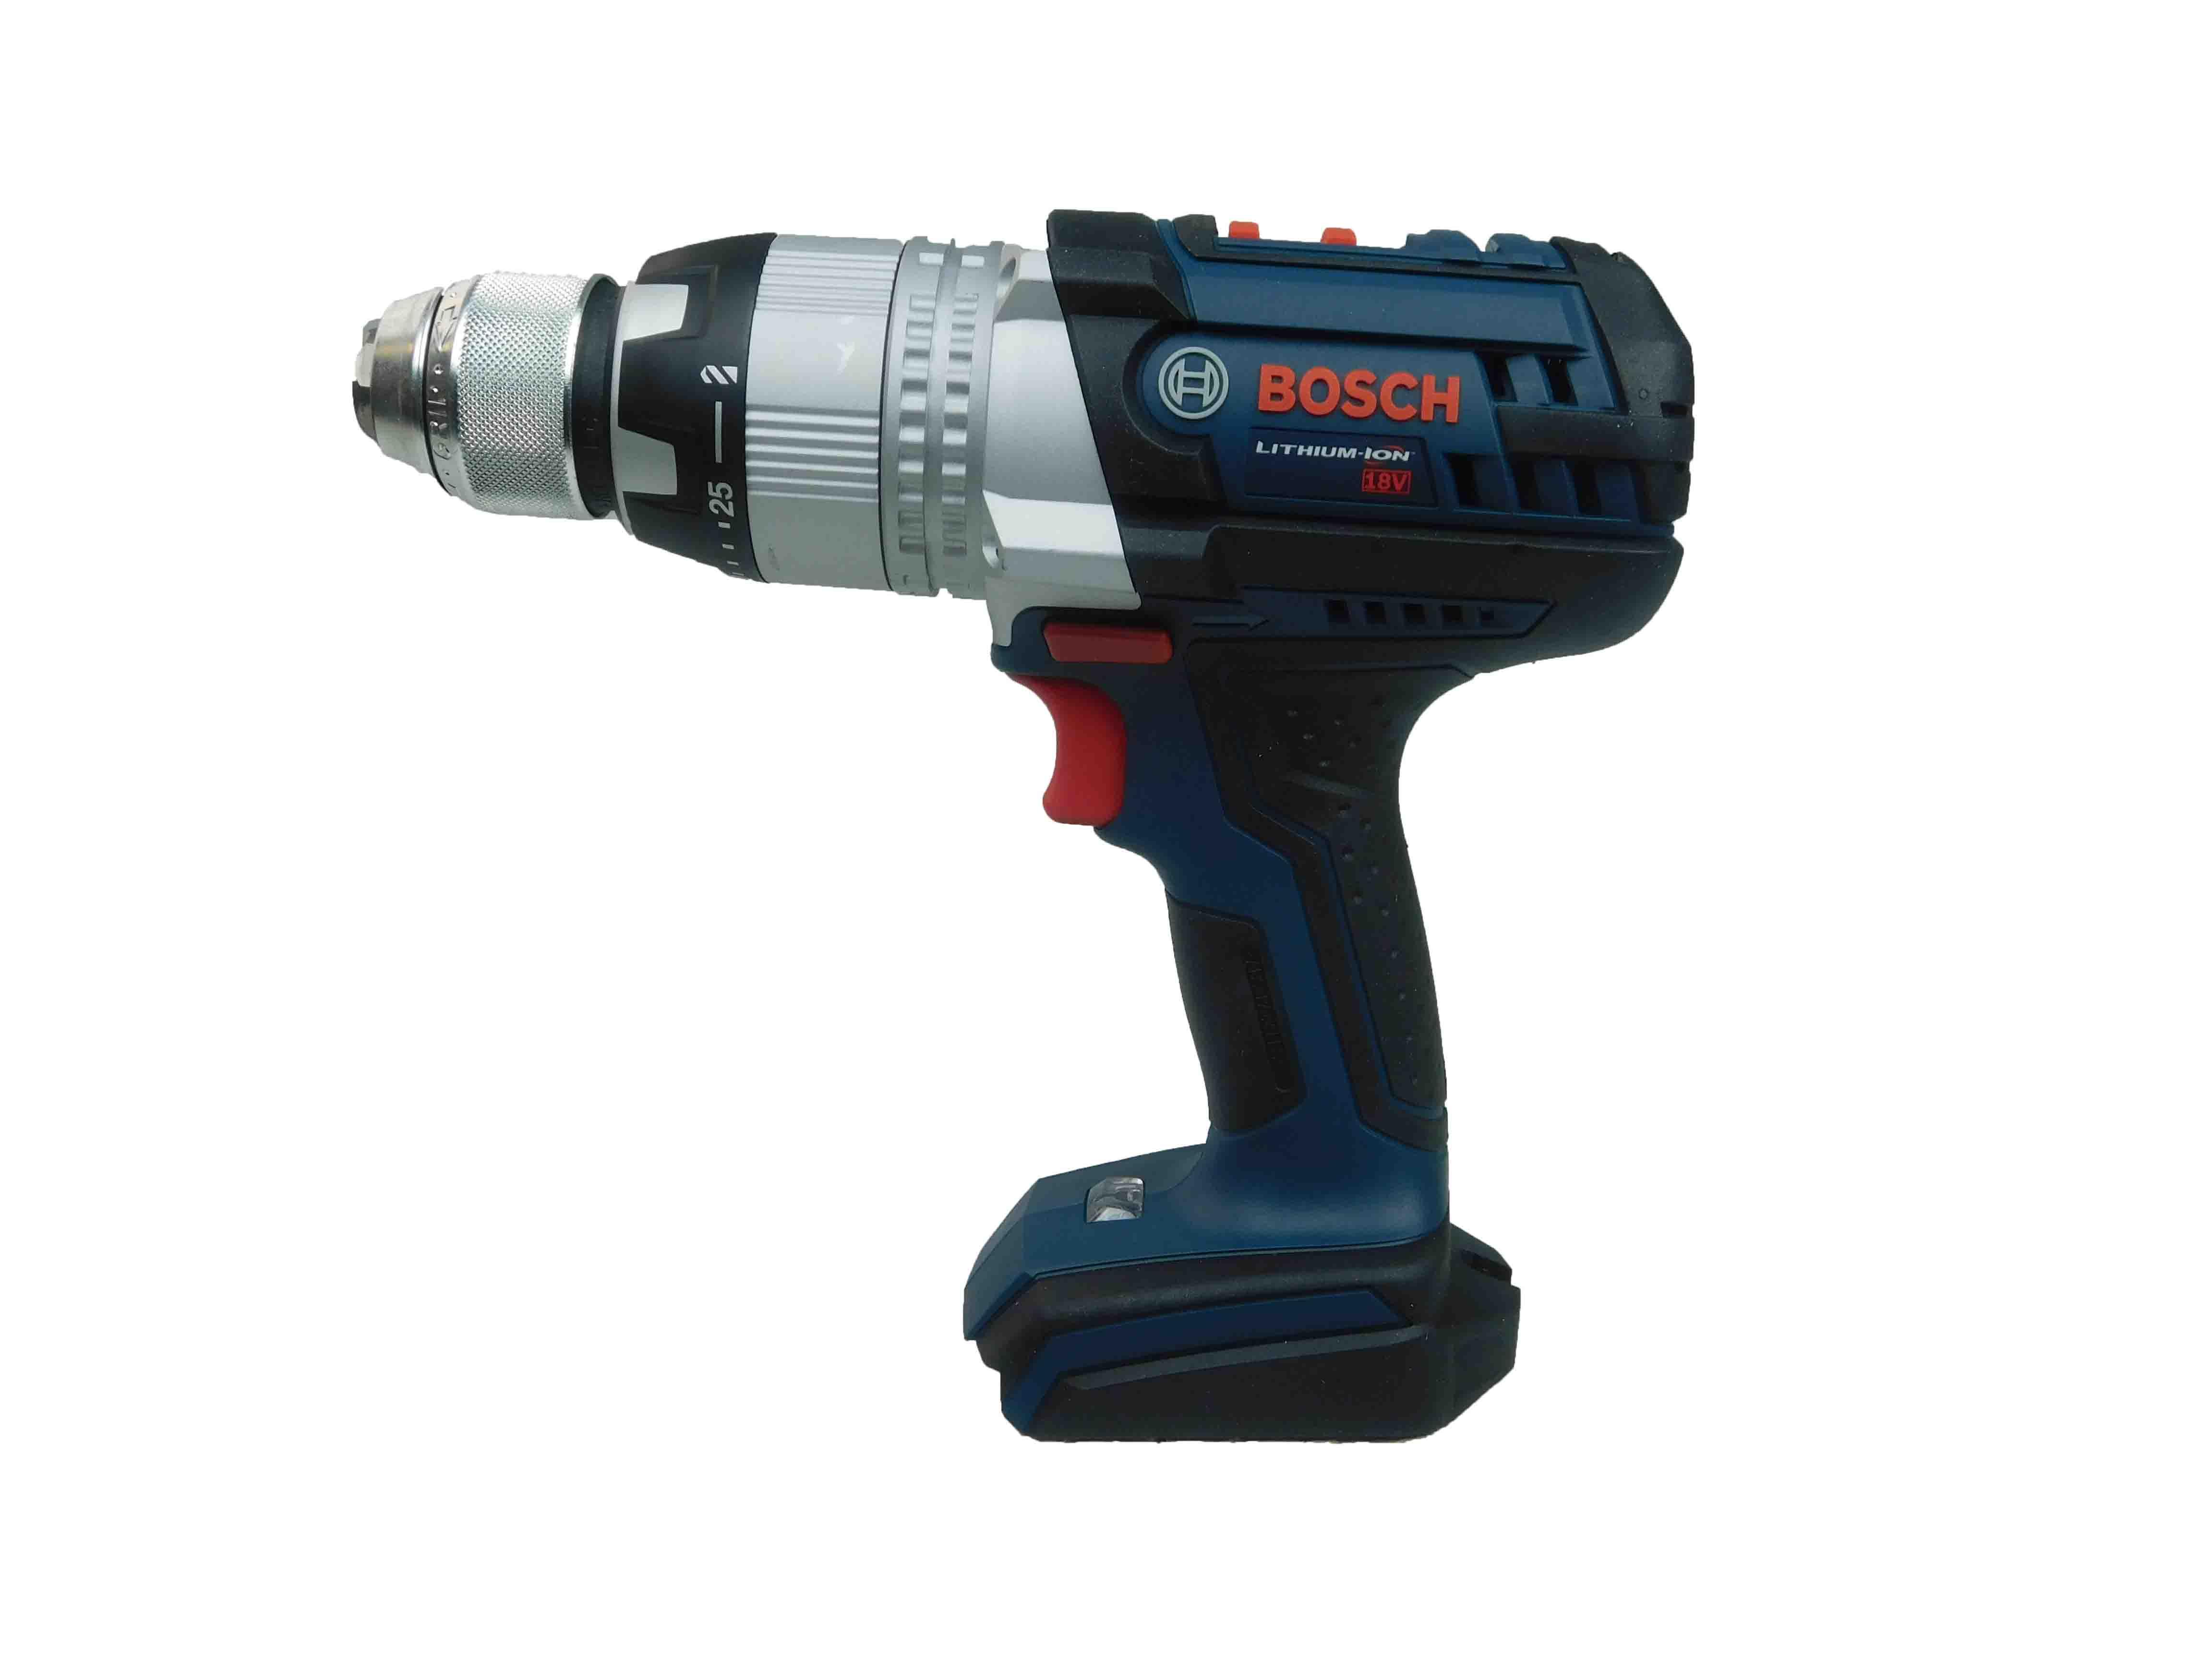 Bosch-HDH181XB18V-Brute-Tough-1-2-In.-Hammer-Drill-Driver-image-14